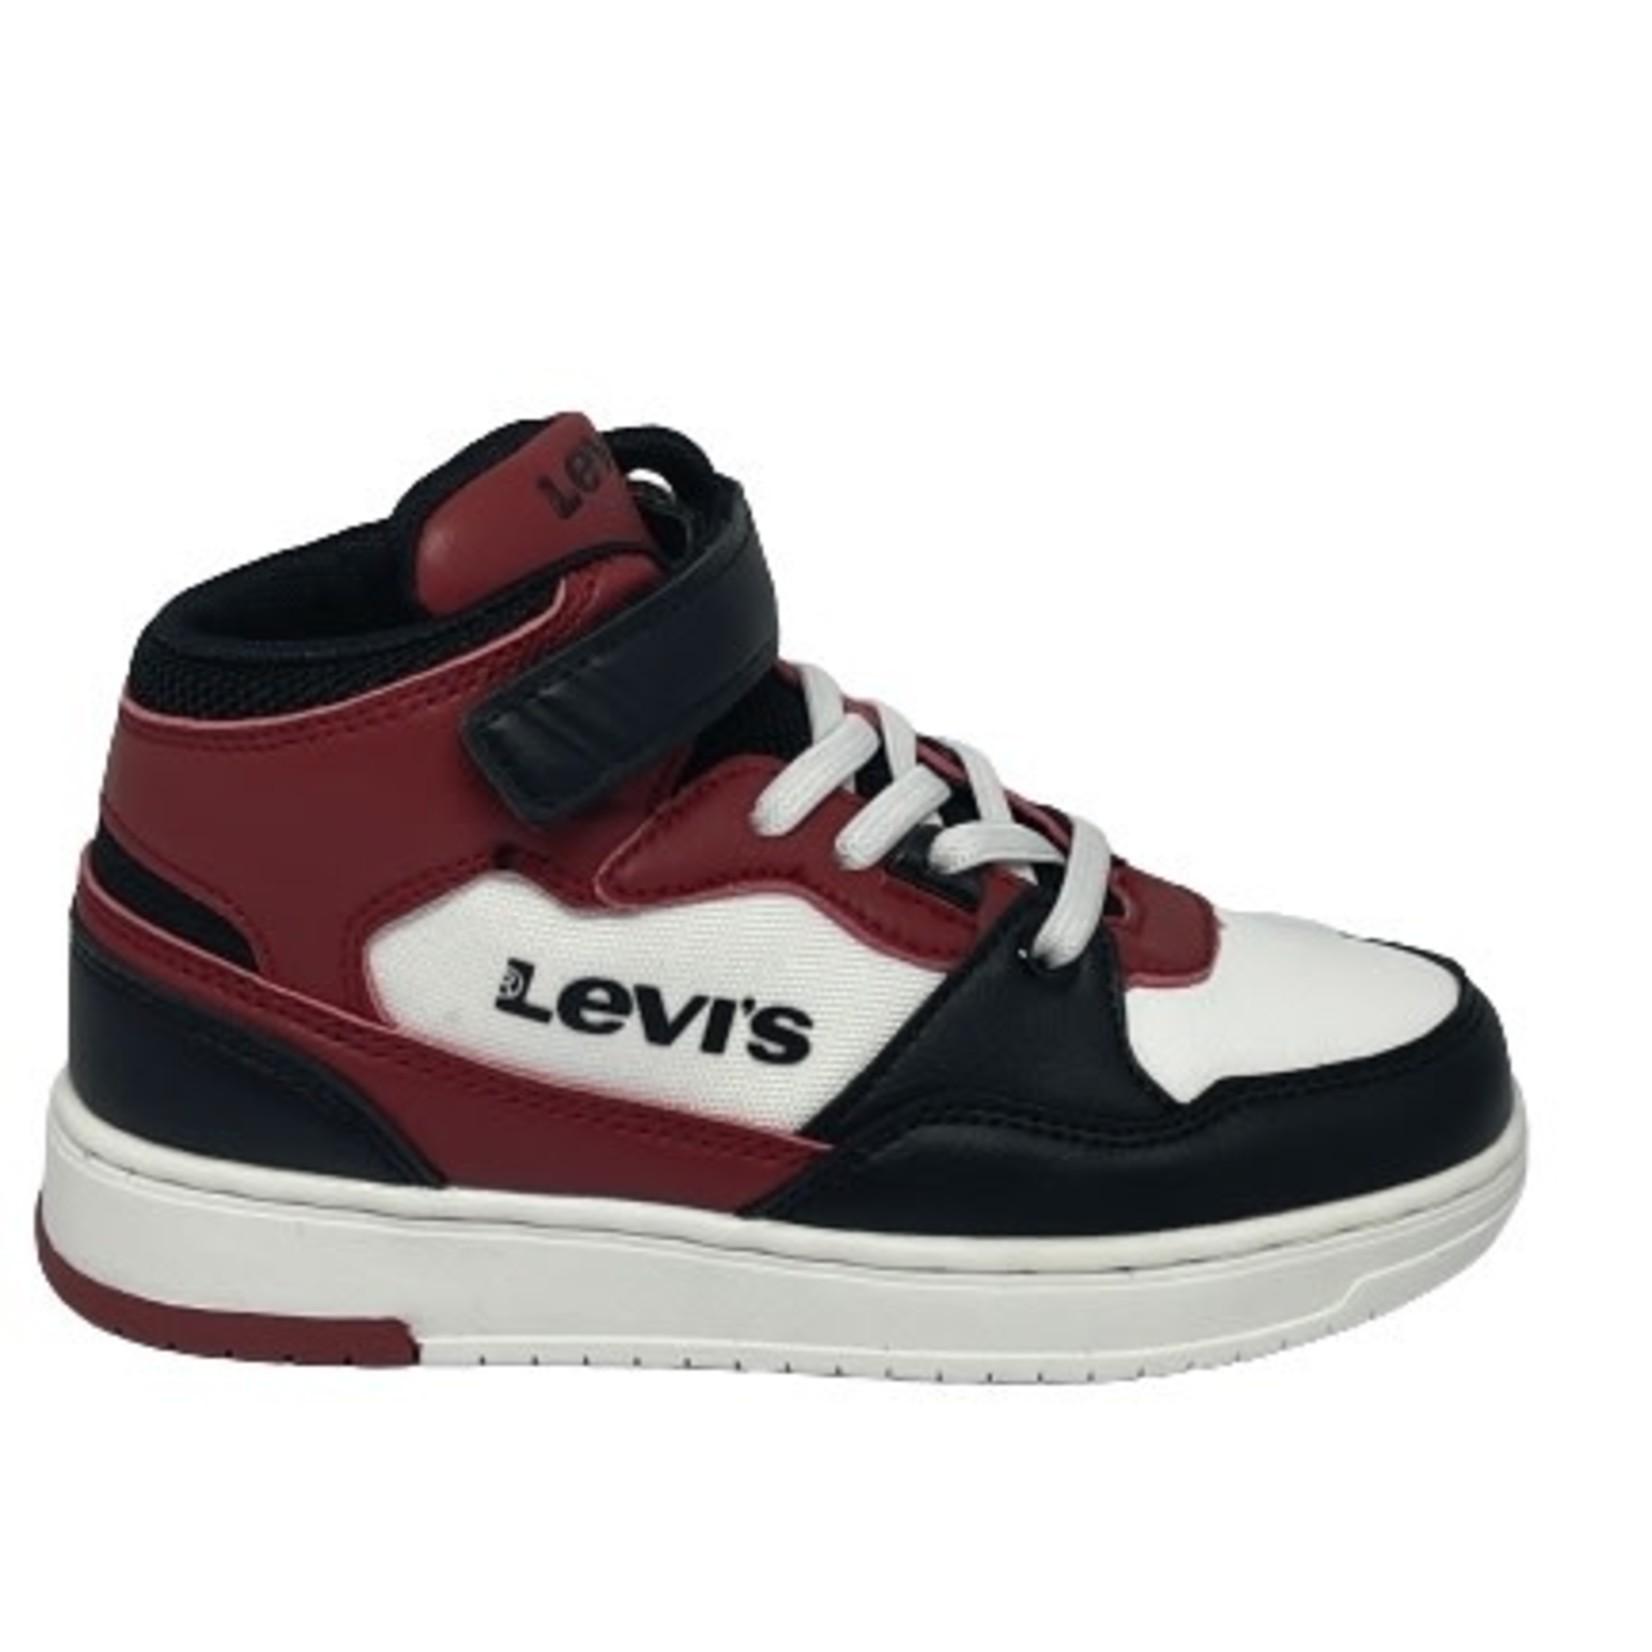 Levis Levis Block Rood